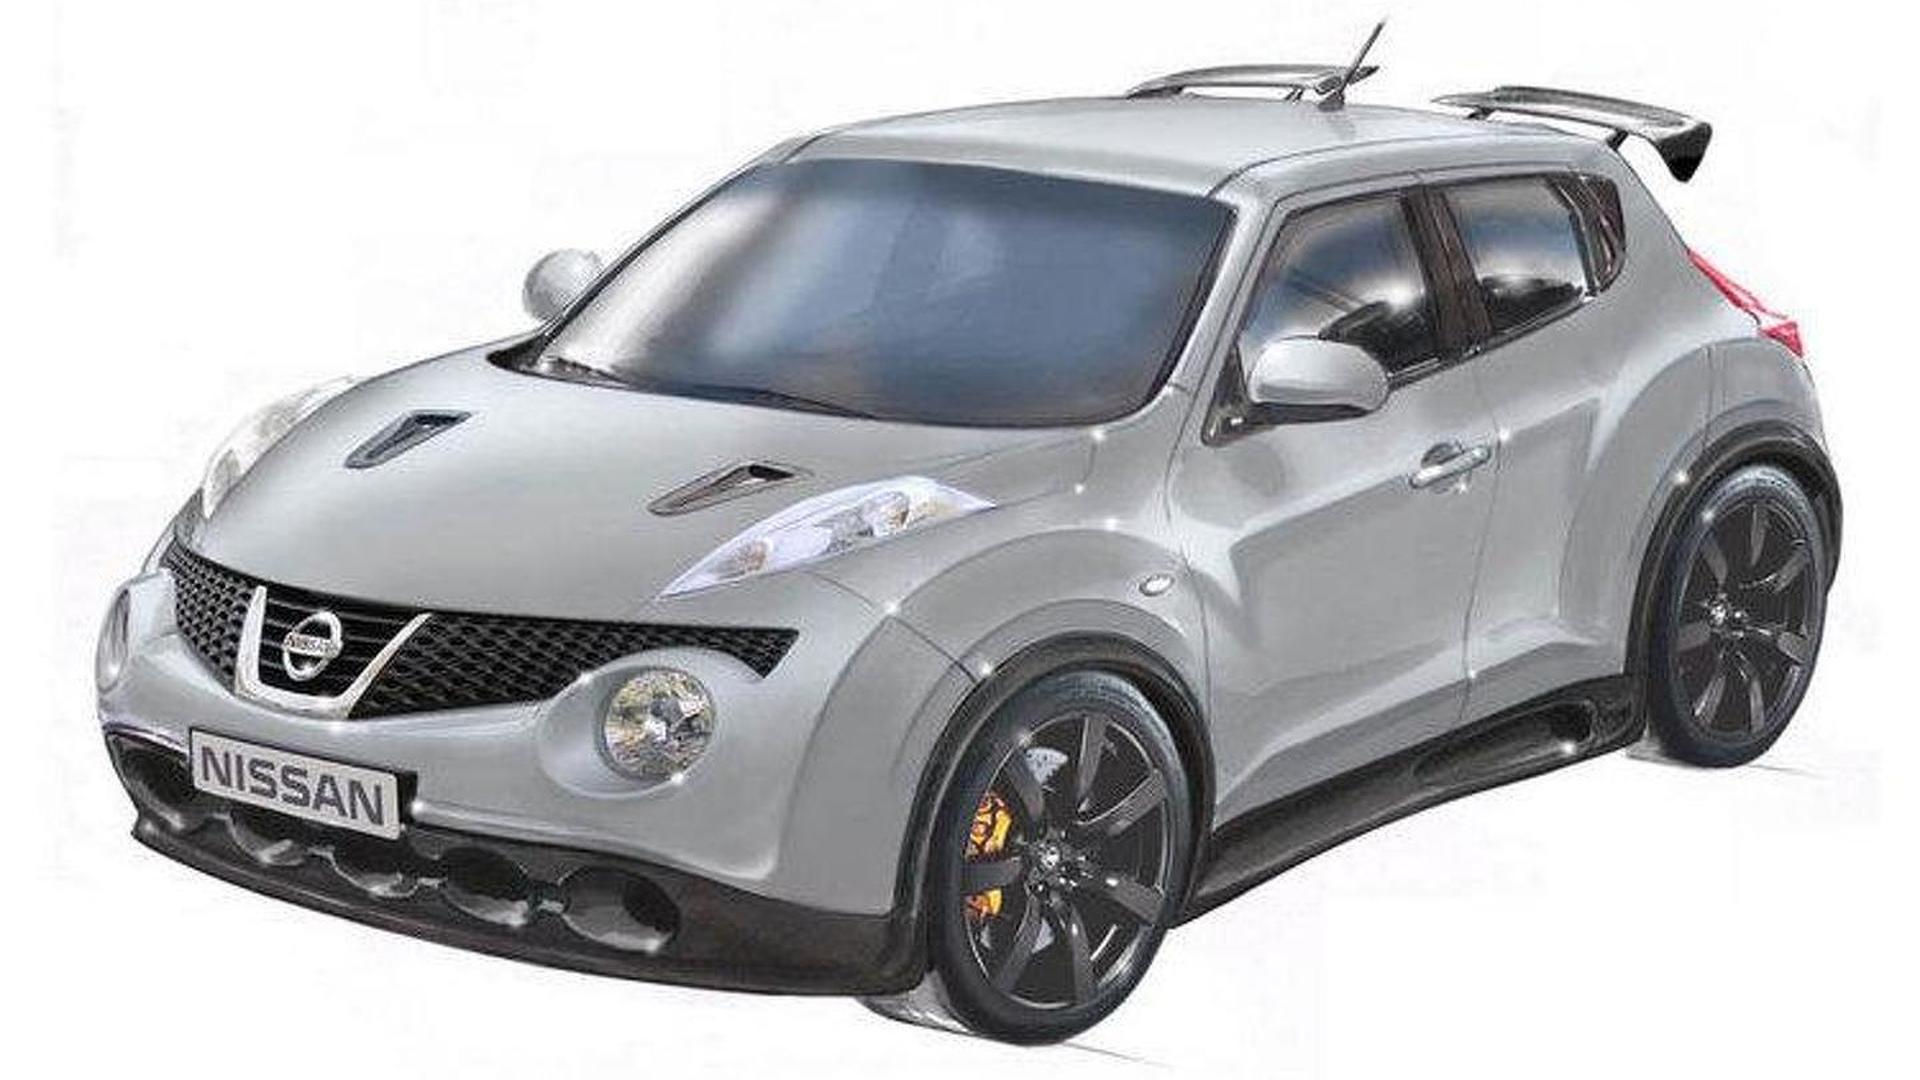 Super Nissan Juke to receive GT-R powertrain